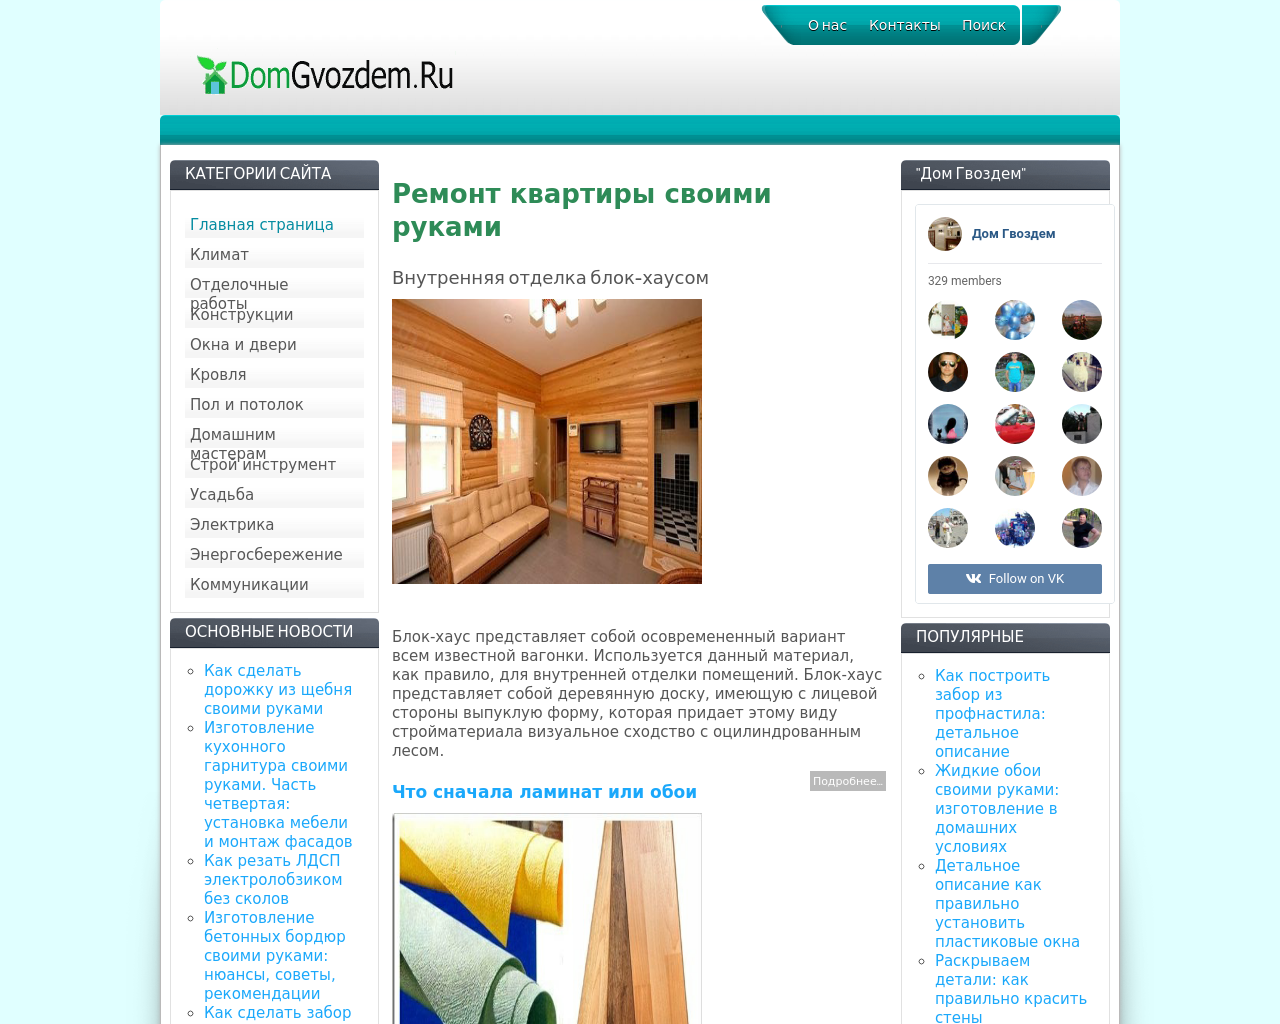 DomGvozdem.Ru-Advertising-Reviews-Pricing